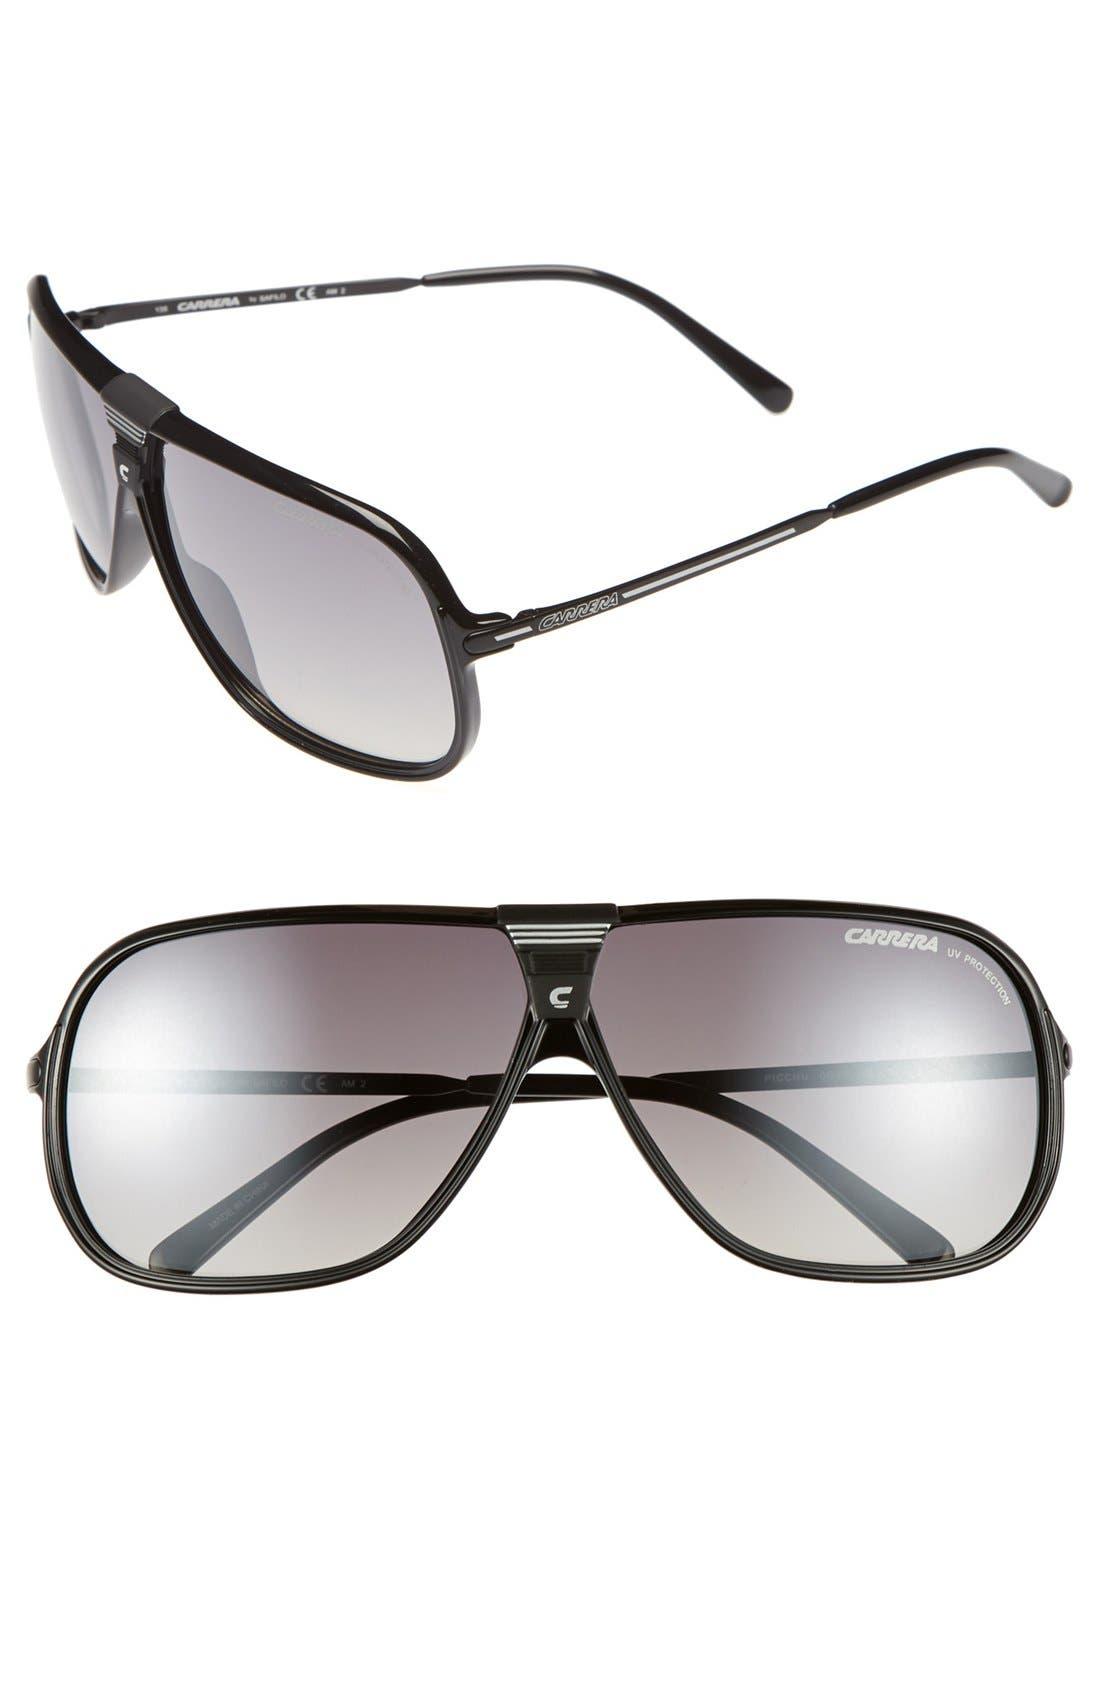 Alternate Image 1 Selected - Carrera Eyewear 'Picchu' 64mm Sunglasses